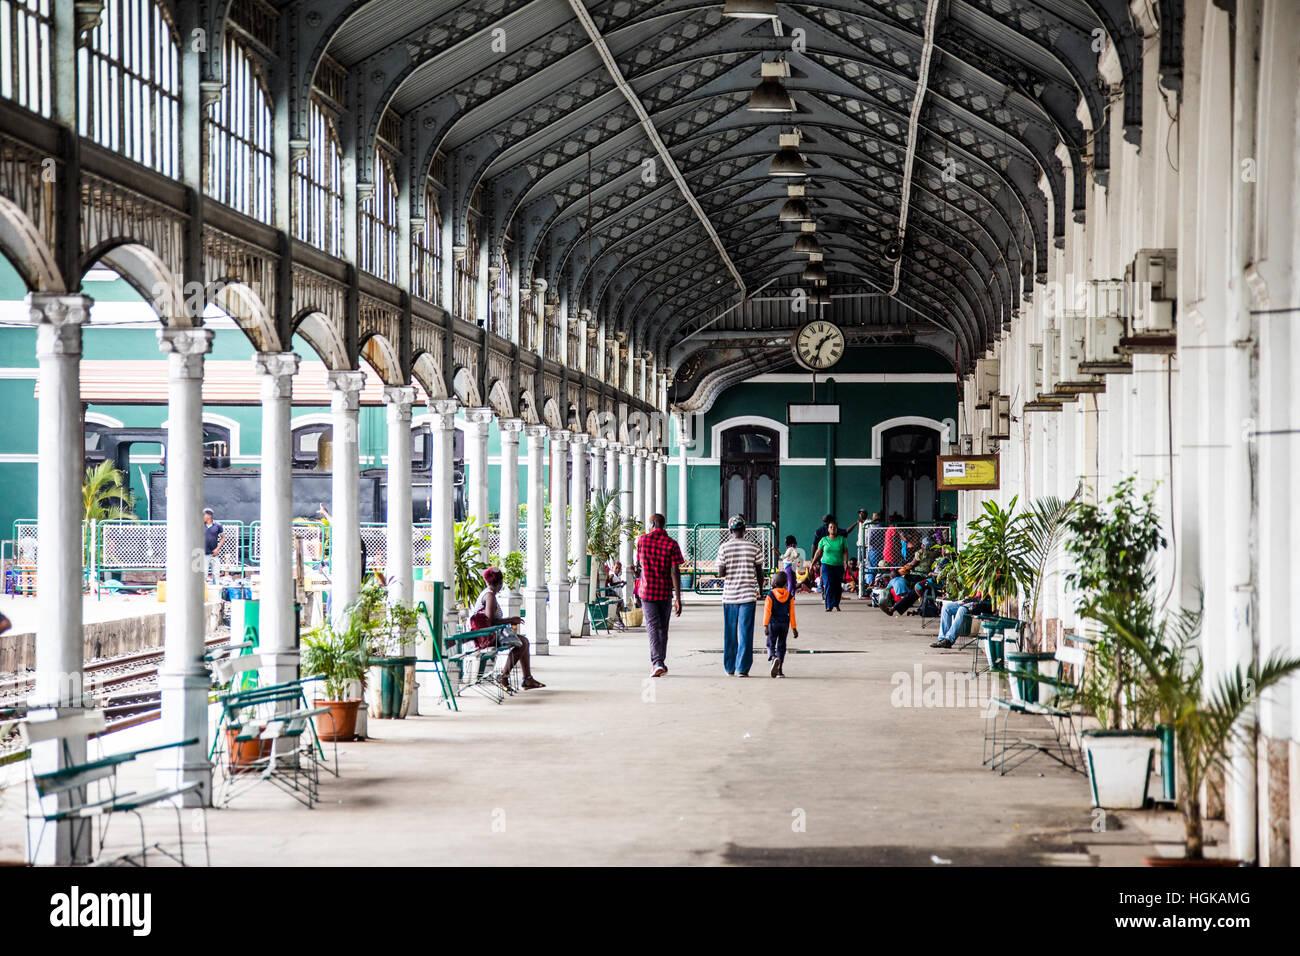 Railway station, Maputo, Mozambique - Stock Image